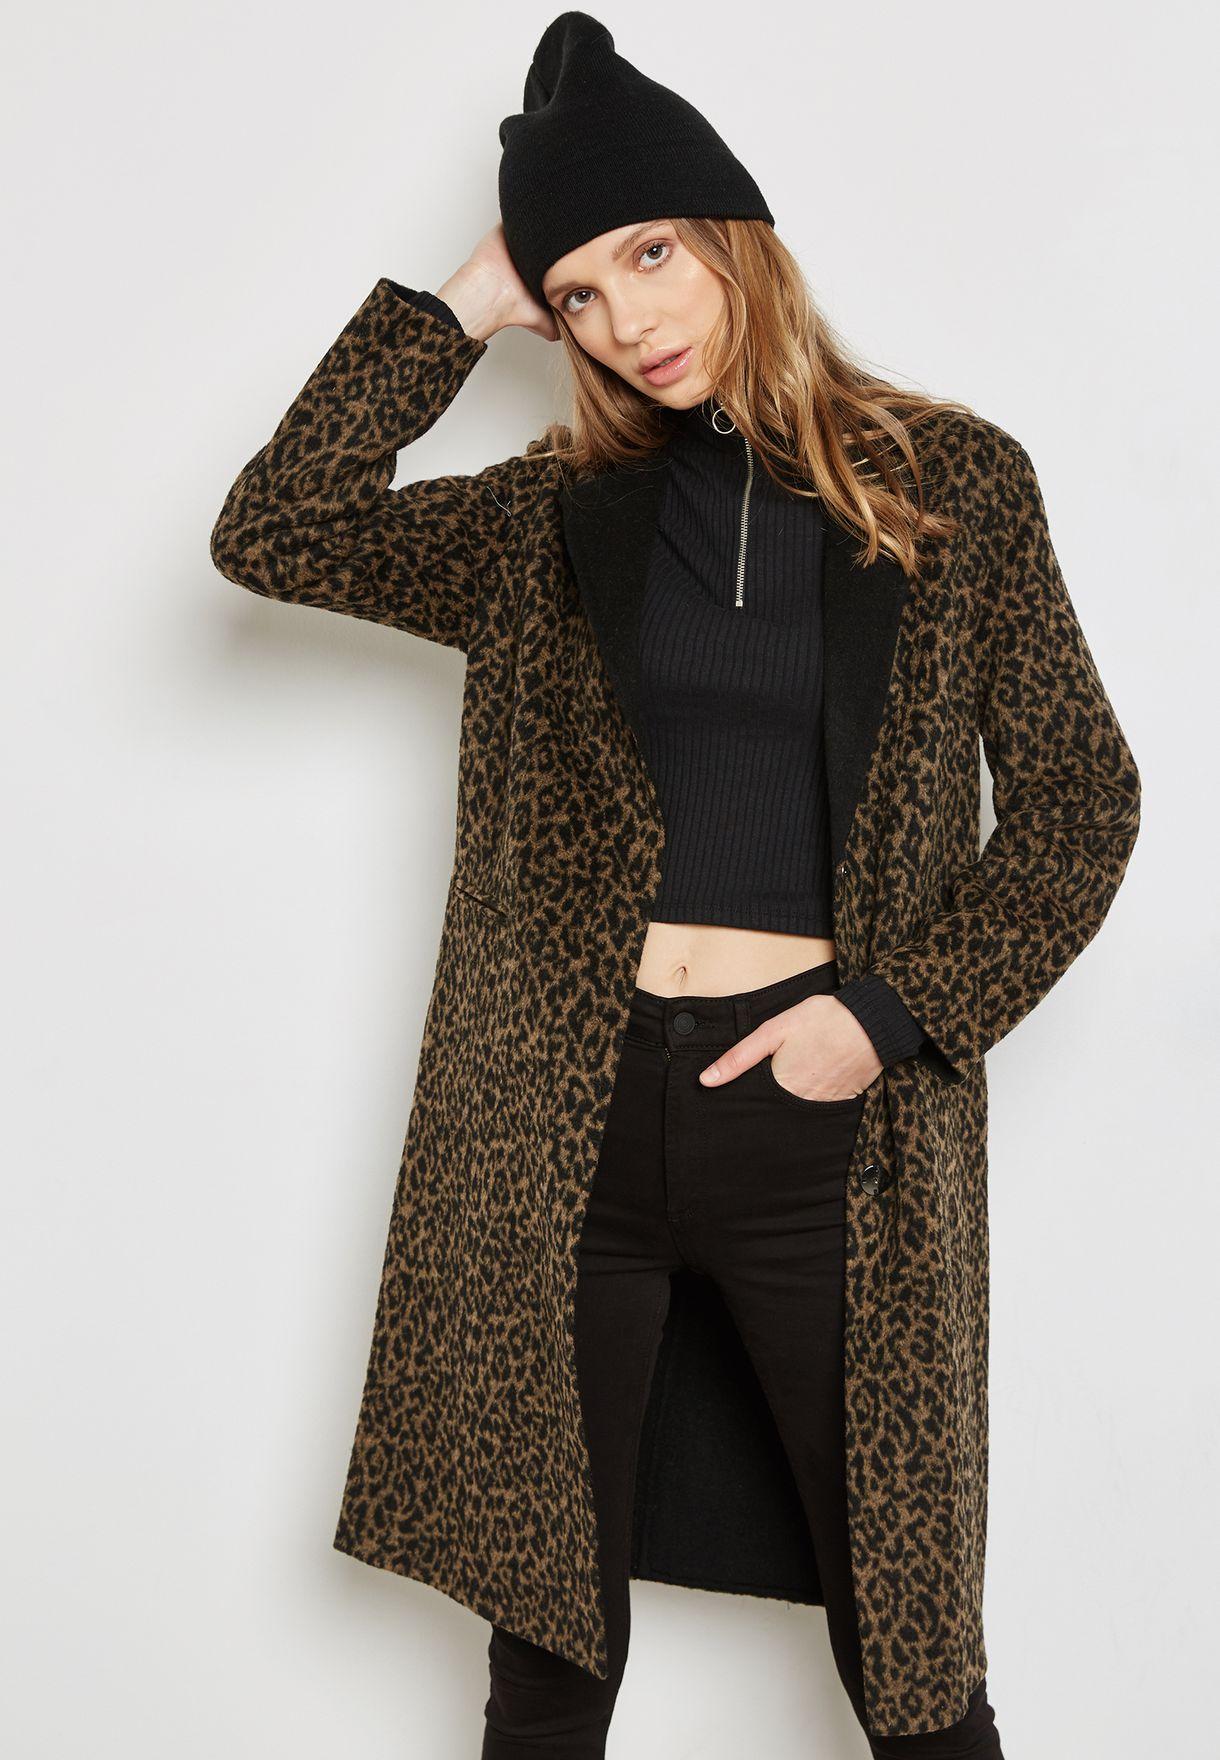 72bf4037c74 Shop Topshop prints Longline Leopard Print Coat 07B02LTRL for Women in  Qatar - TO856AT18AQV